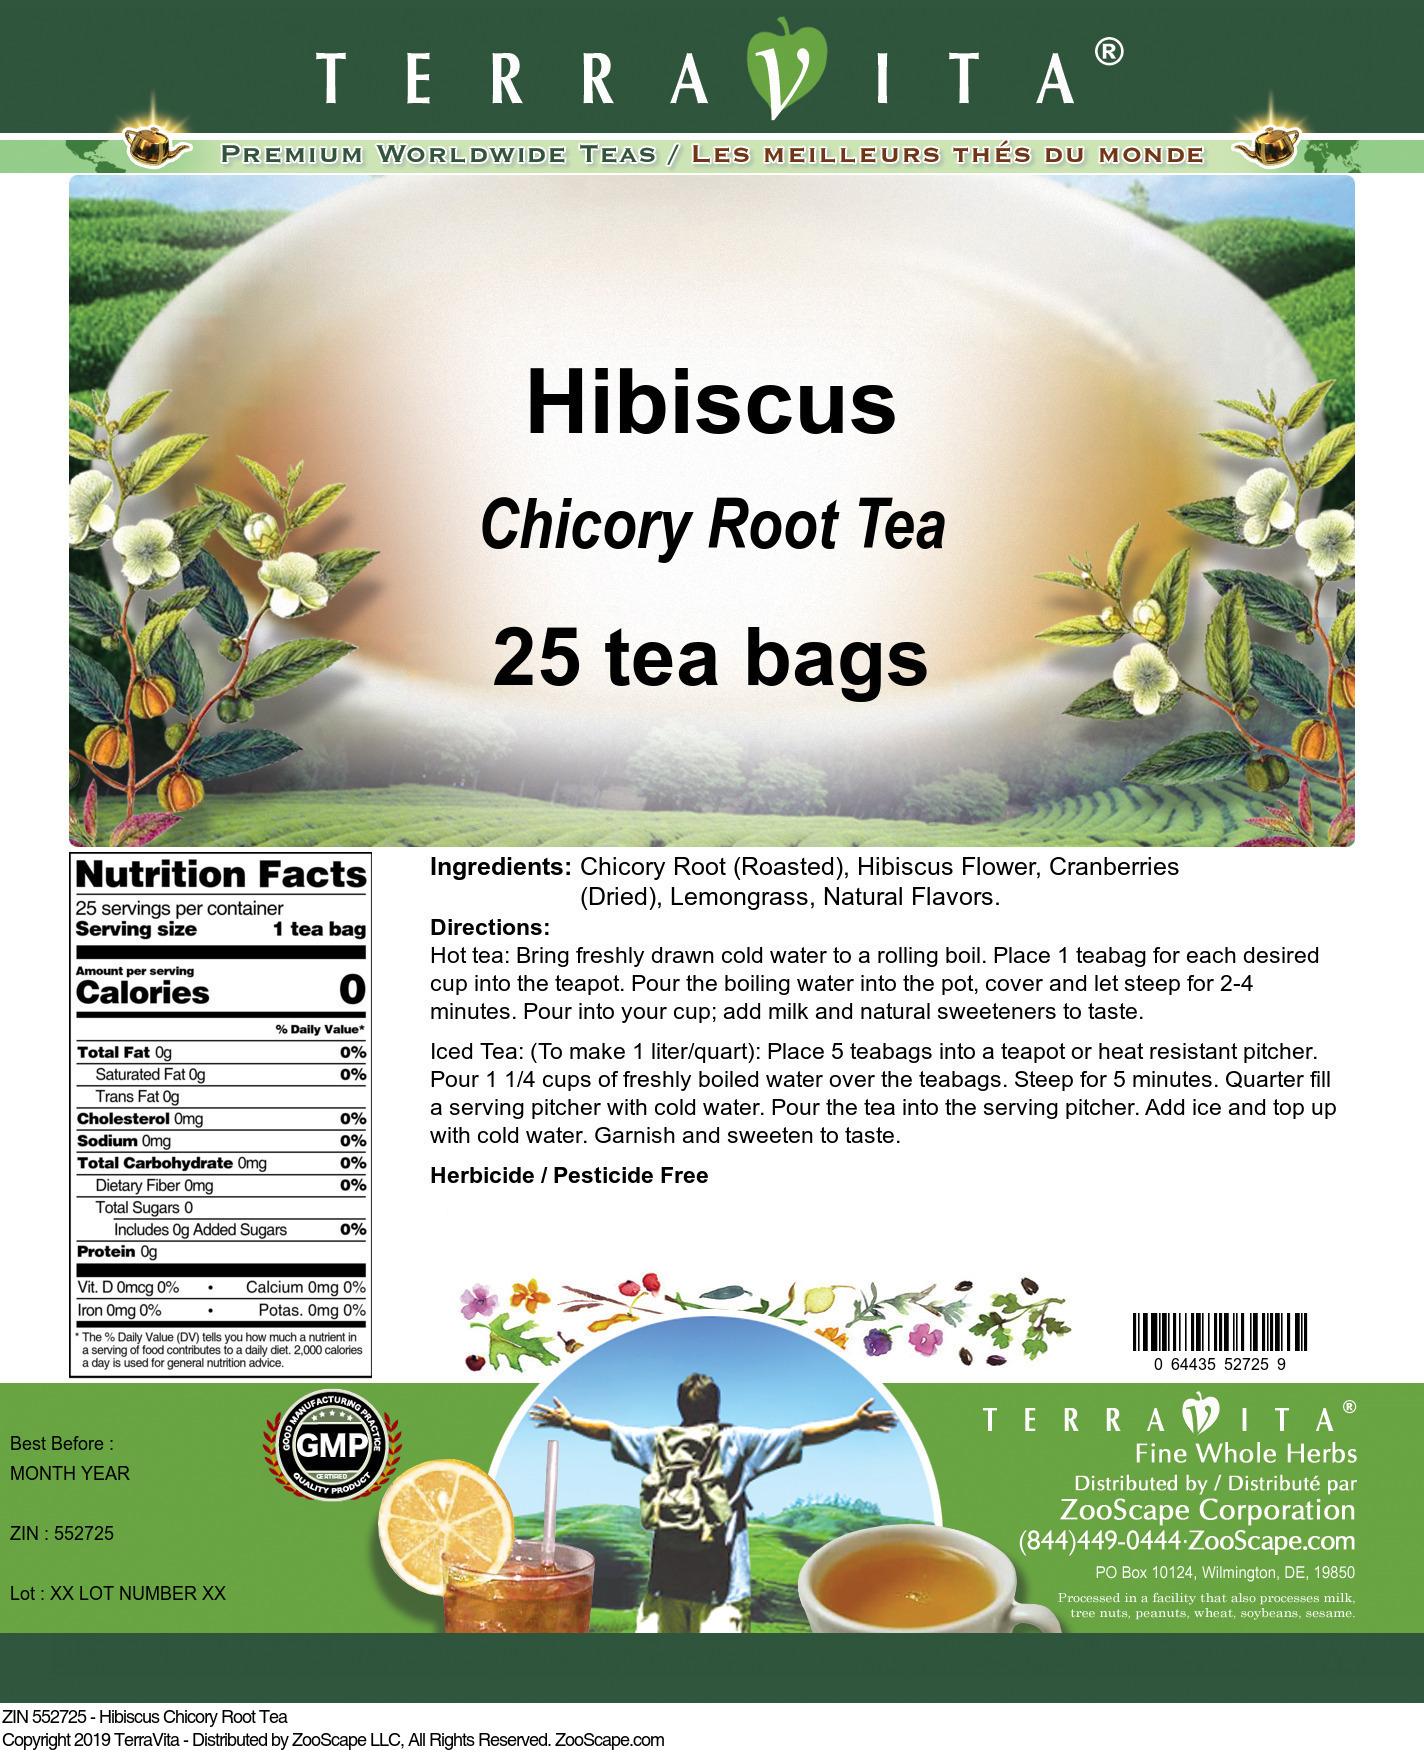 Hibiscus Chicory Root Tea